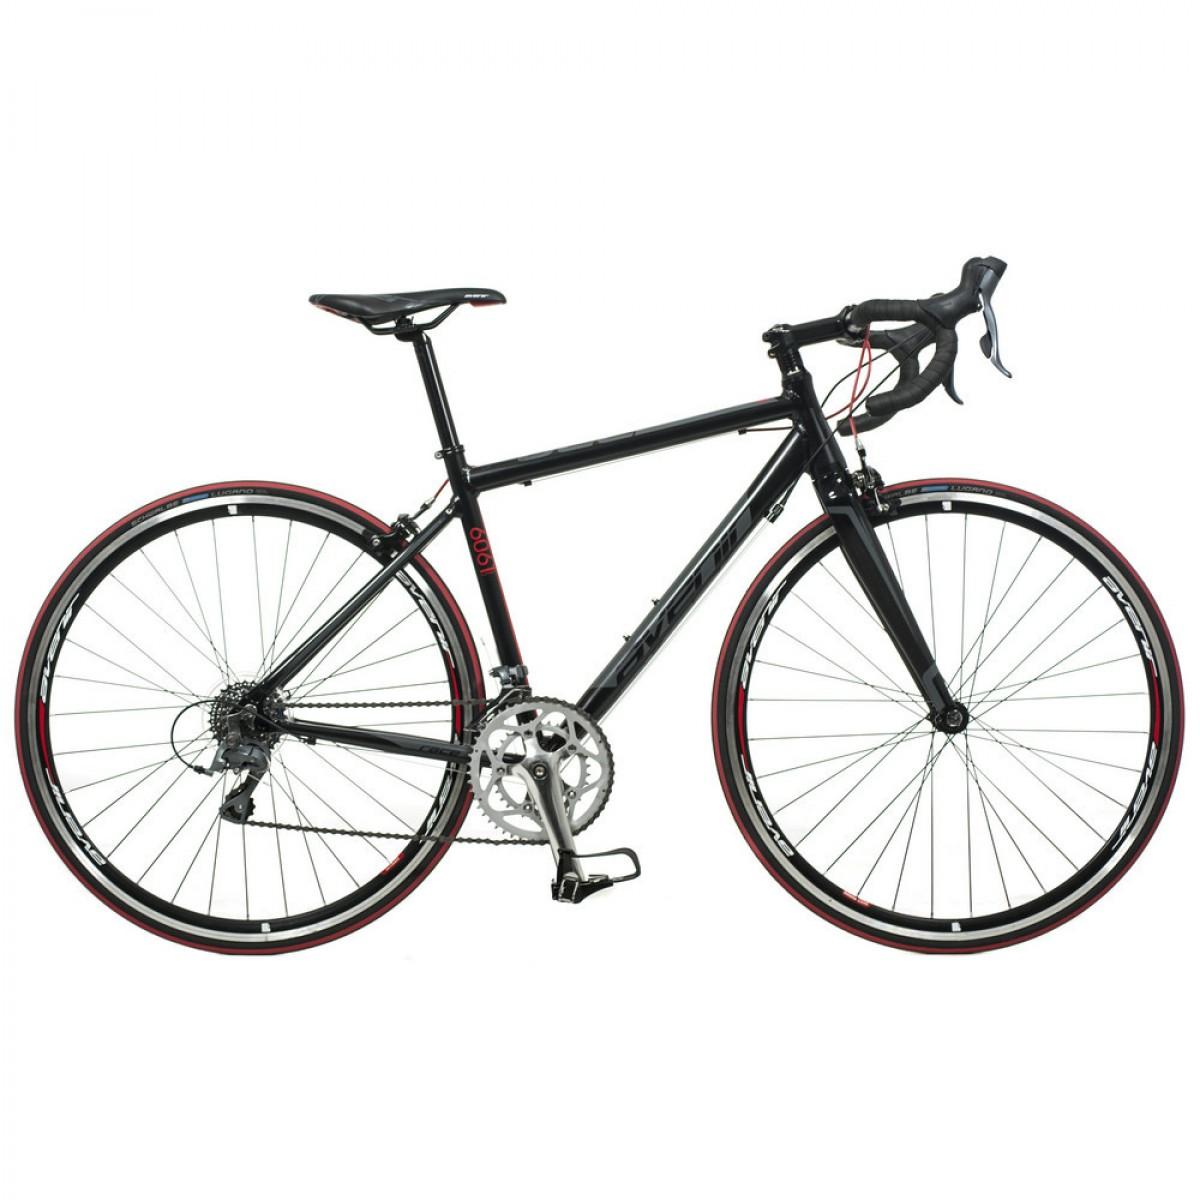 Bsa Raleigh Bicycle